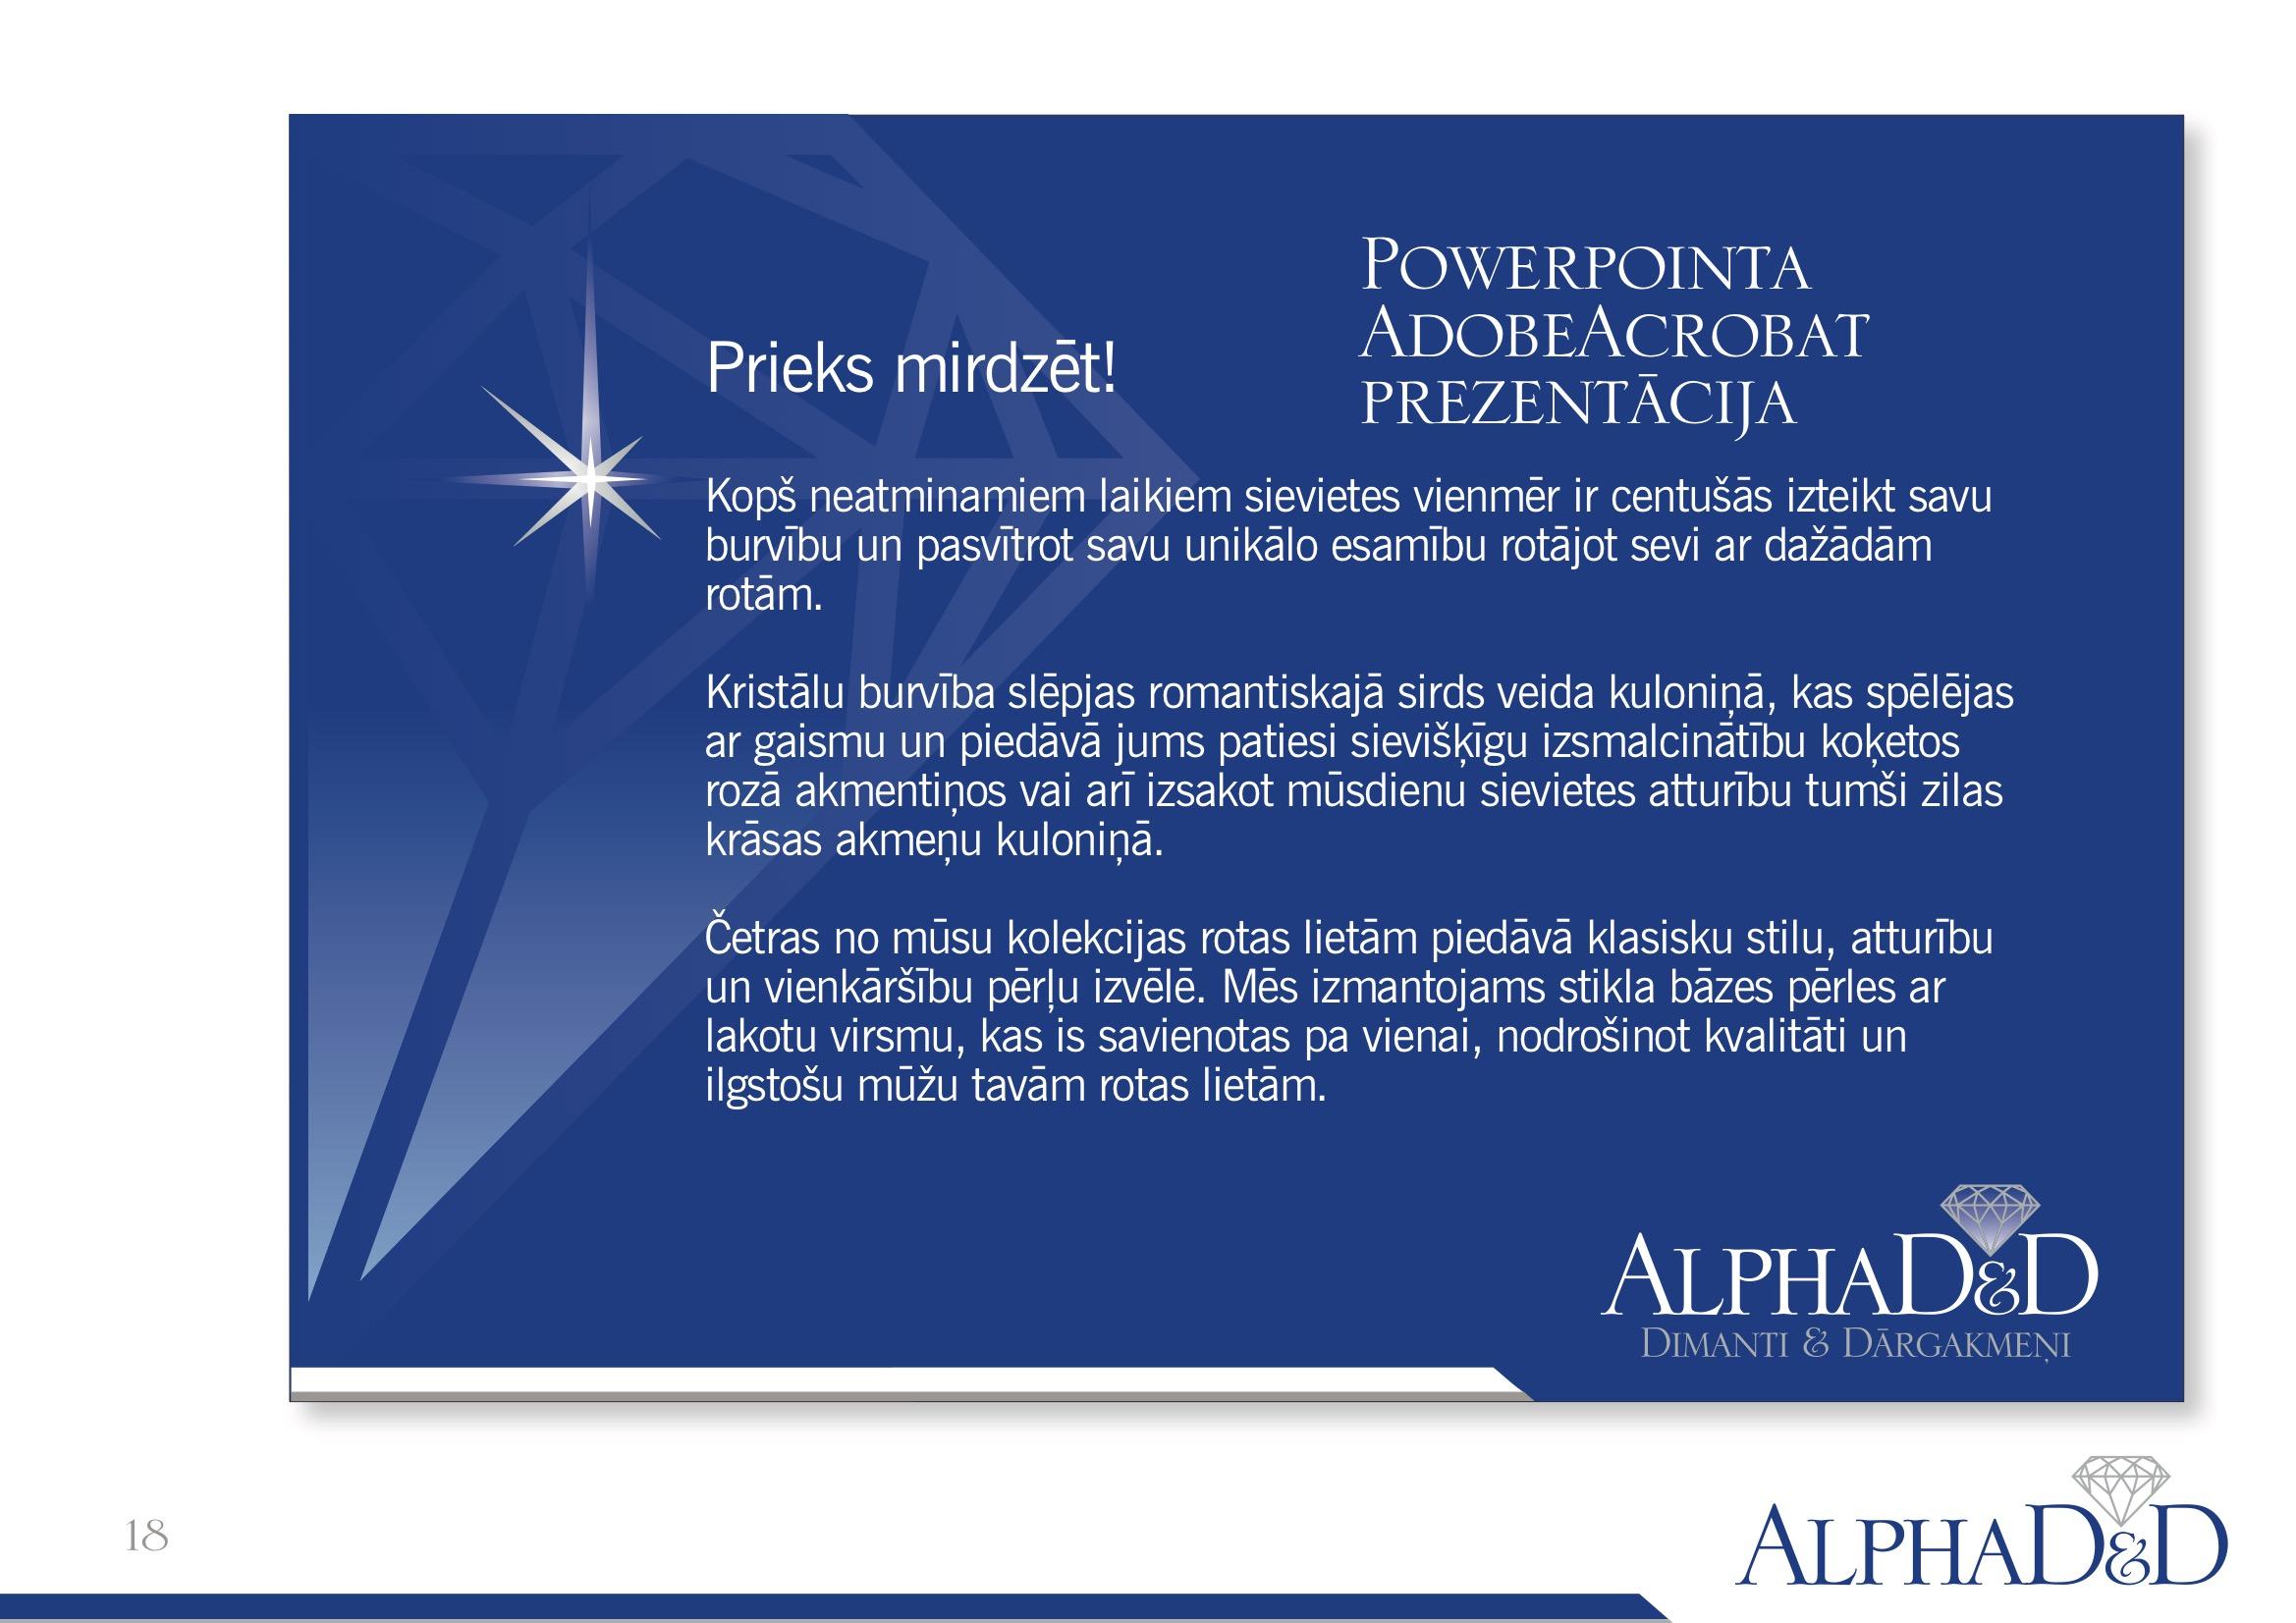 AlphaDD_Stils 18